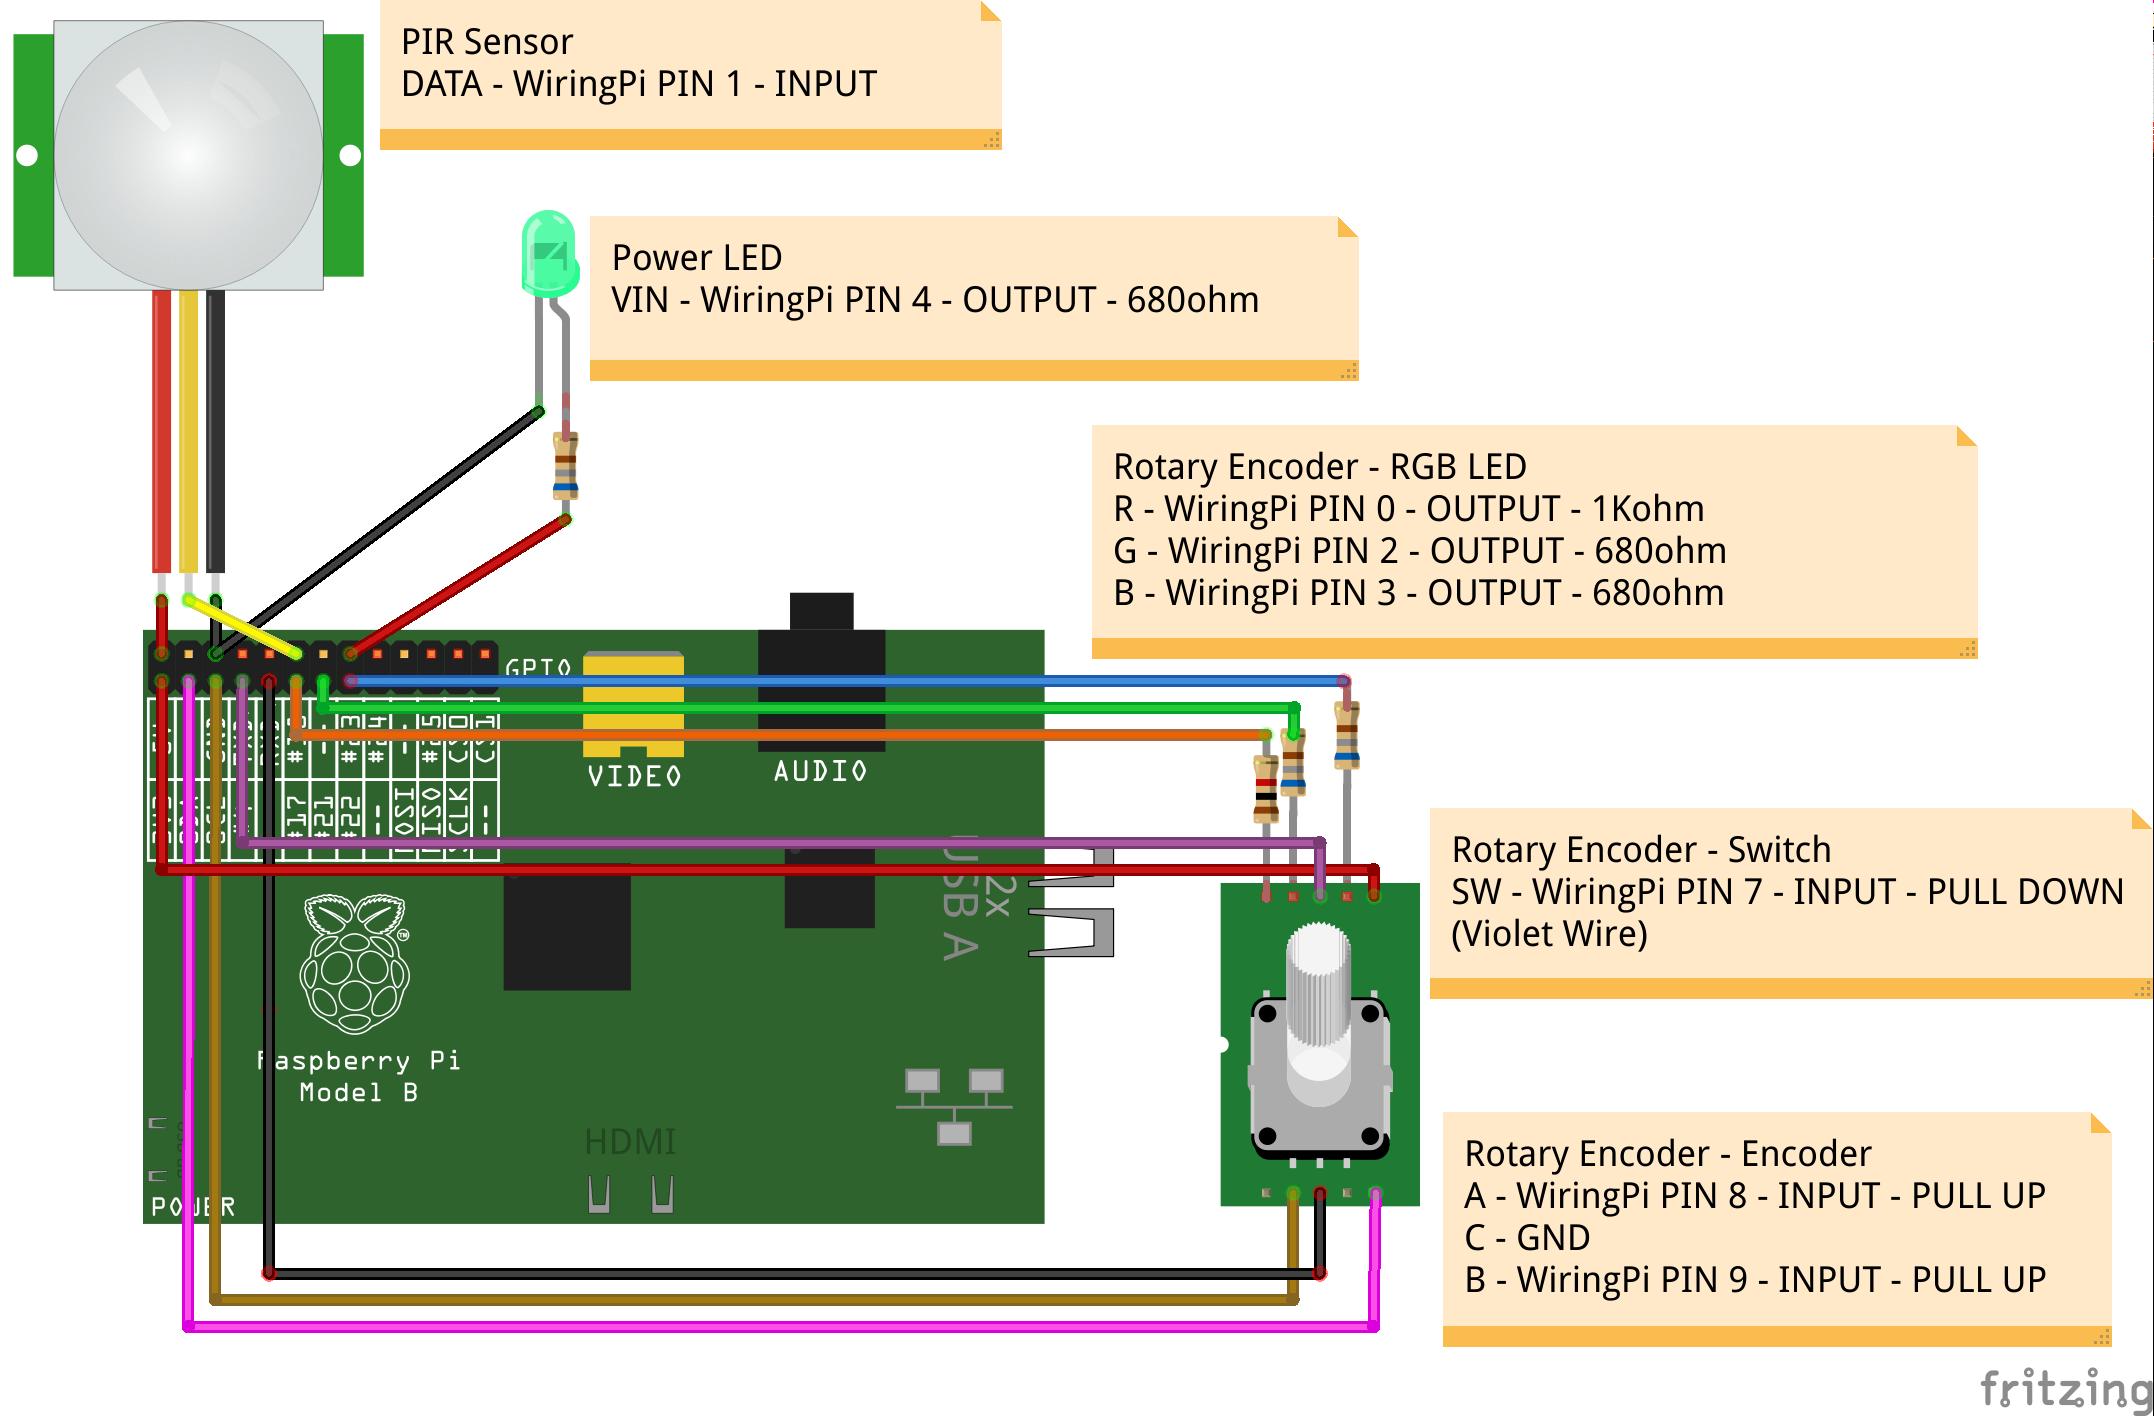 motion sensor webradio hackster io rh hackster io Rotary Encoder Schematic Mechanical Rotary Encoder